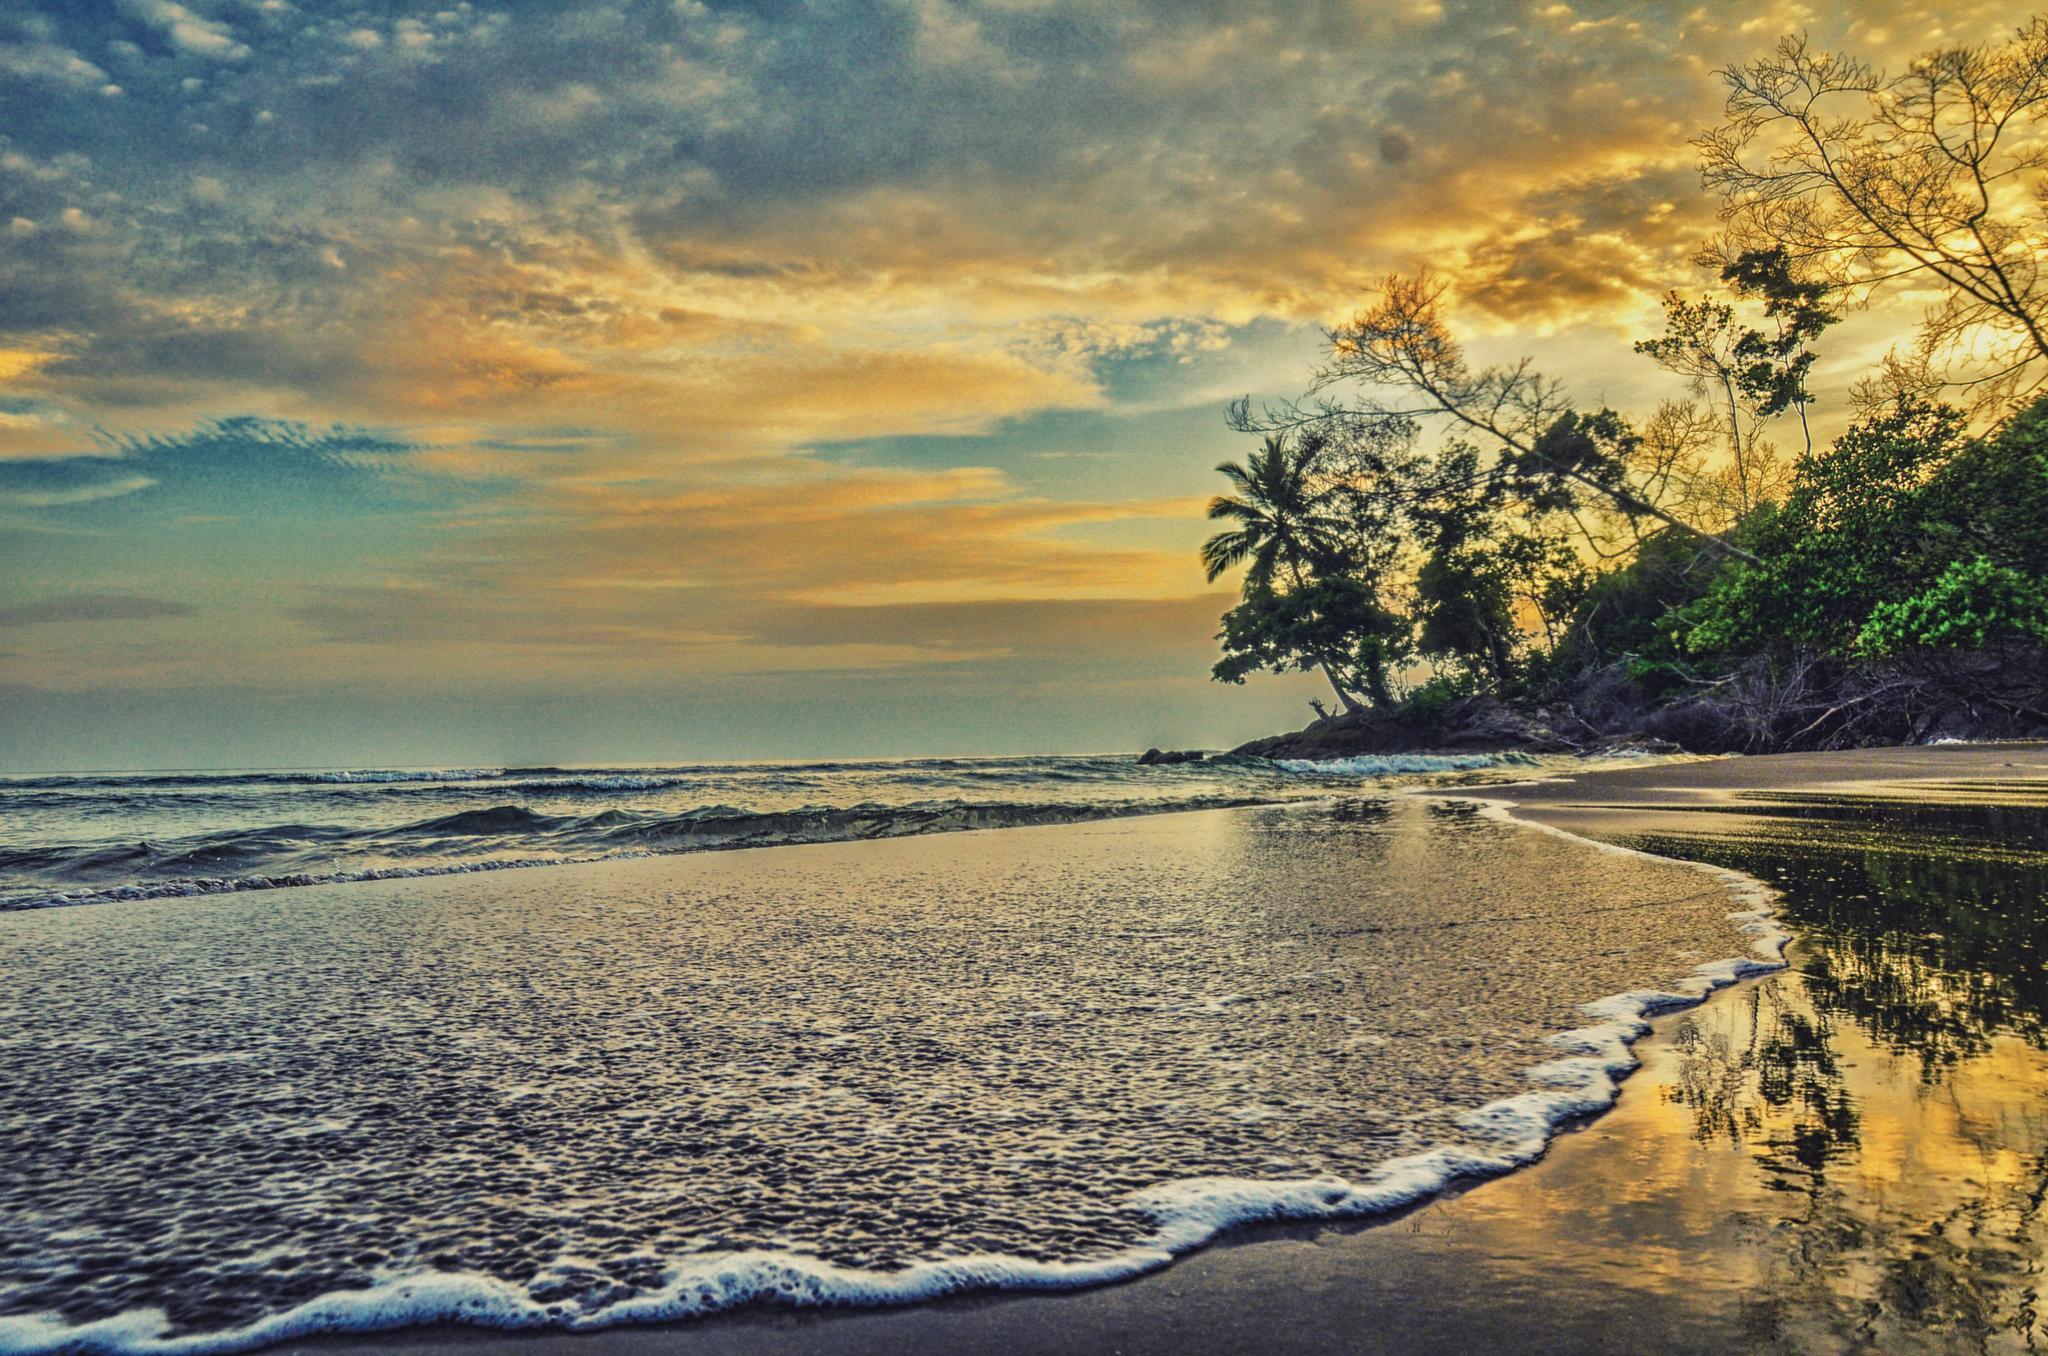 Hiden Beach by Ricky Andesta